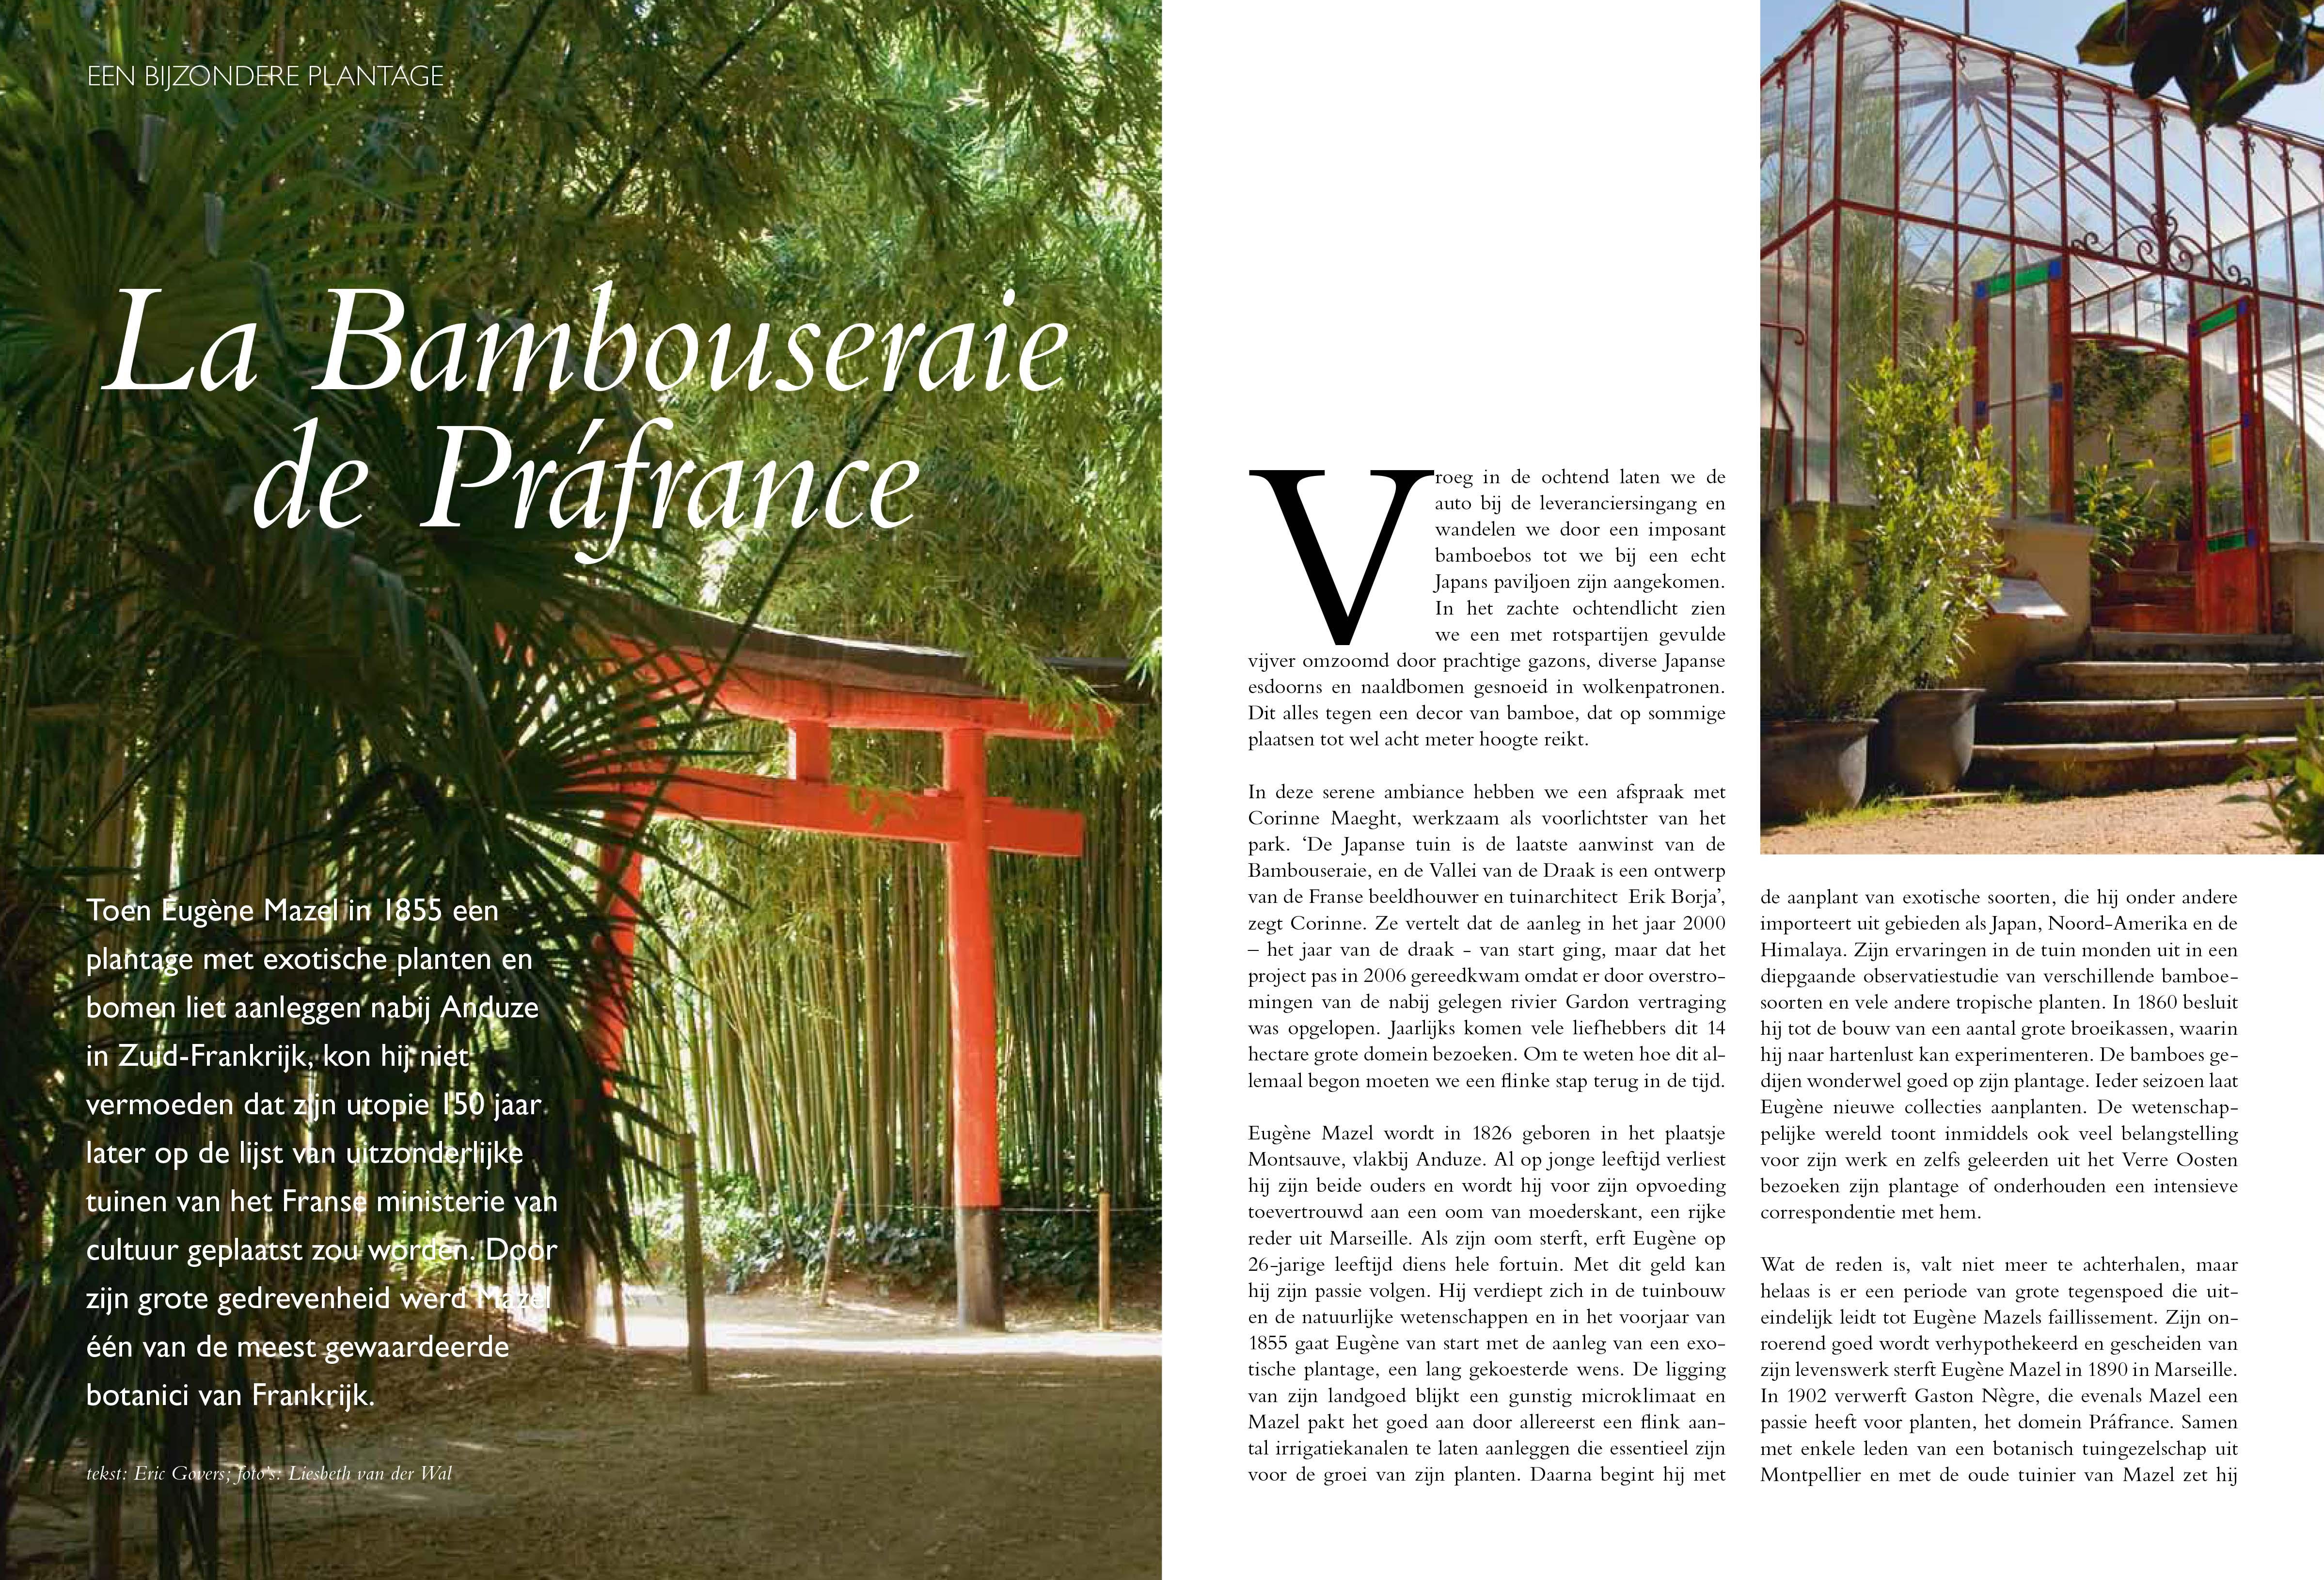 Tuinspecial La Bambouseraie